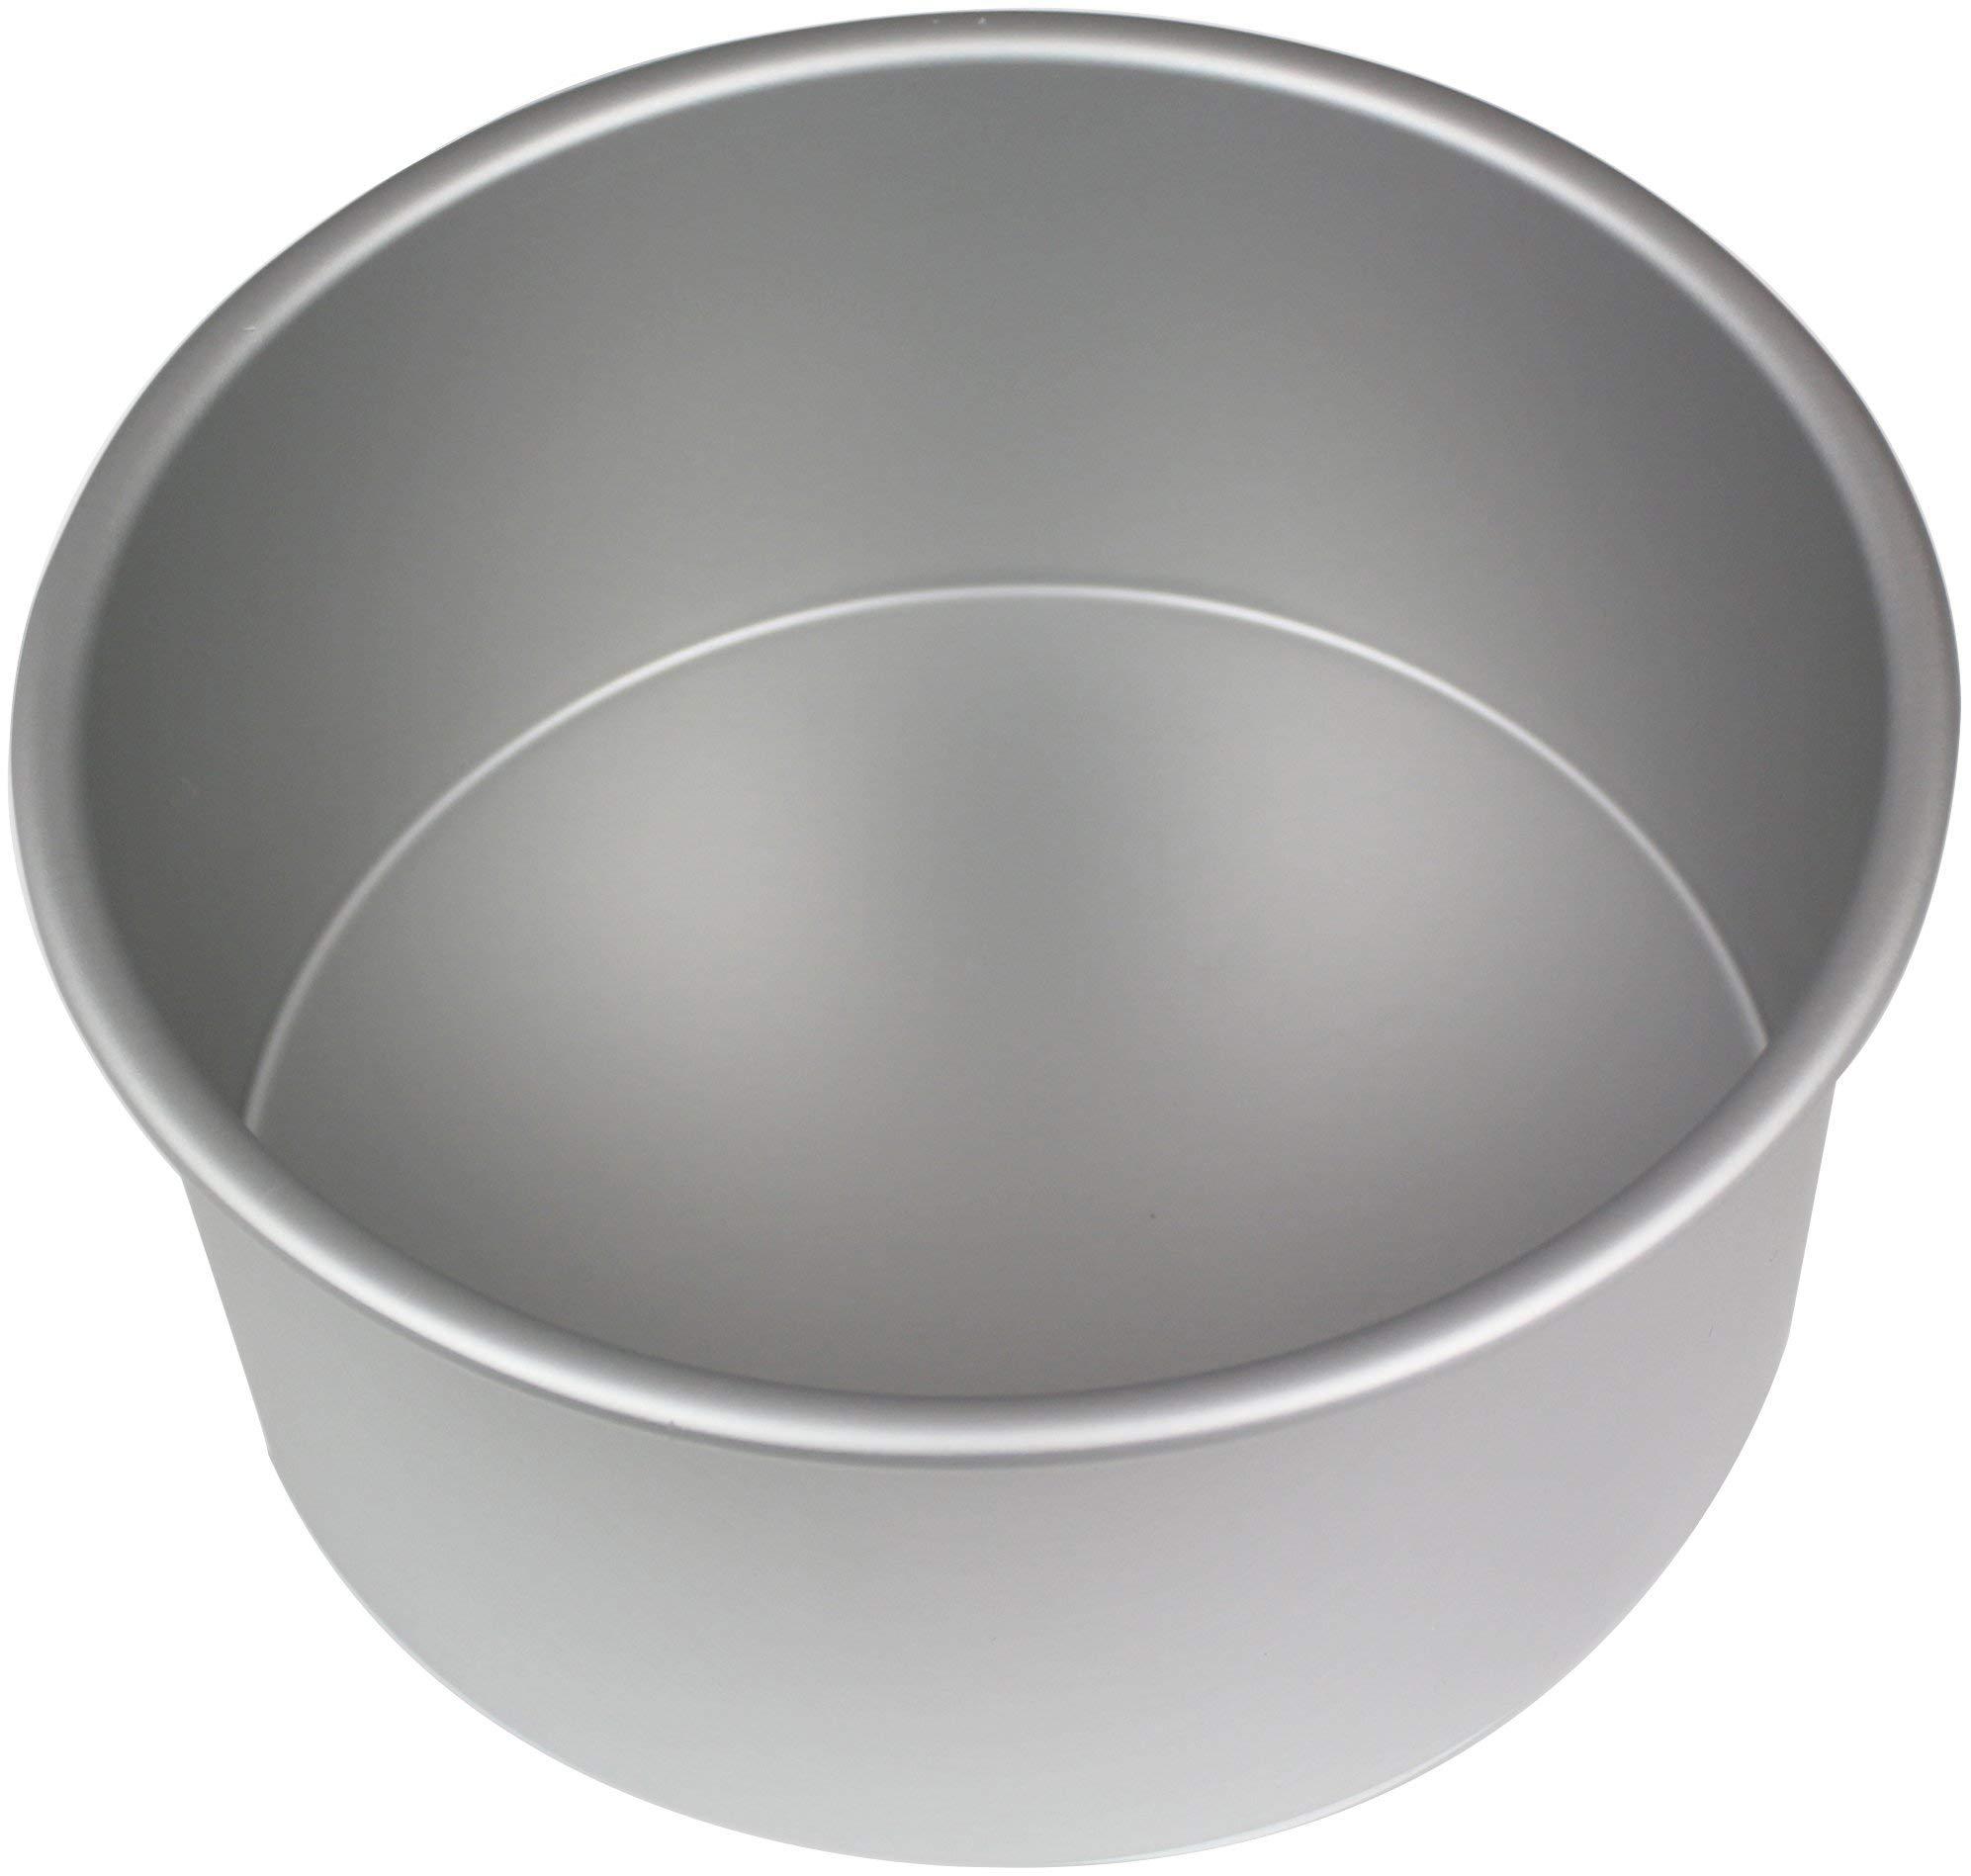 PME RND084 Seamless Professional Aluminum Baking, 8'' x 4'' Anodised Aluminium Round Cake Pan 8 x 4-Inch Deep, 8, Silver by PME